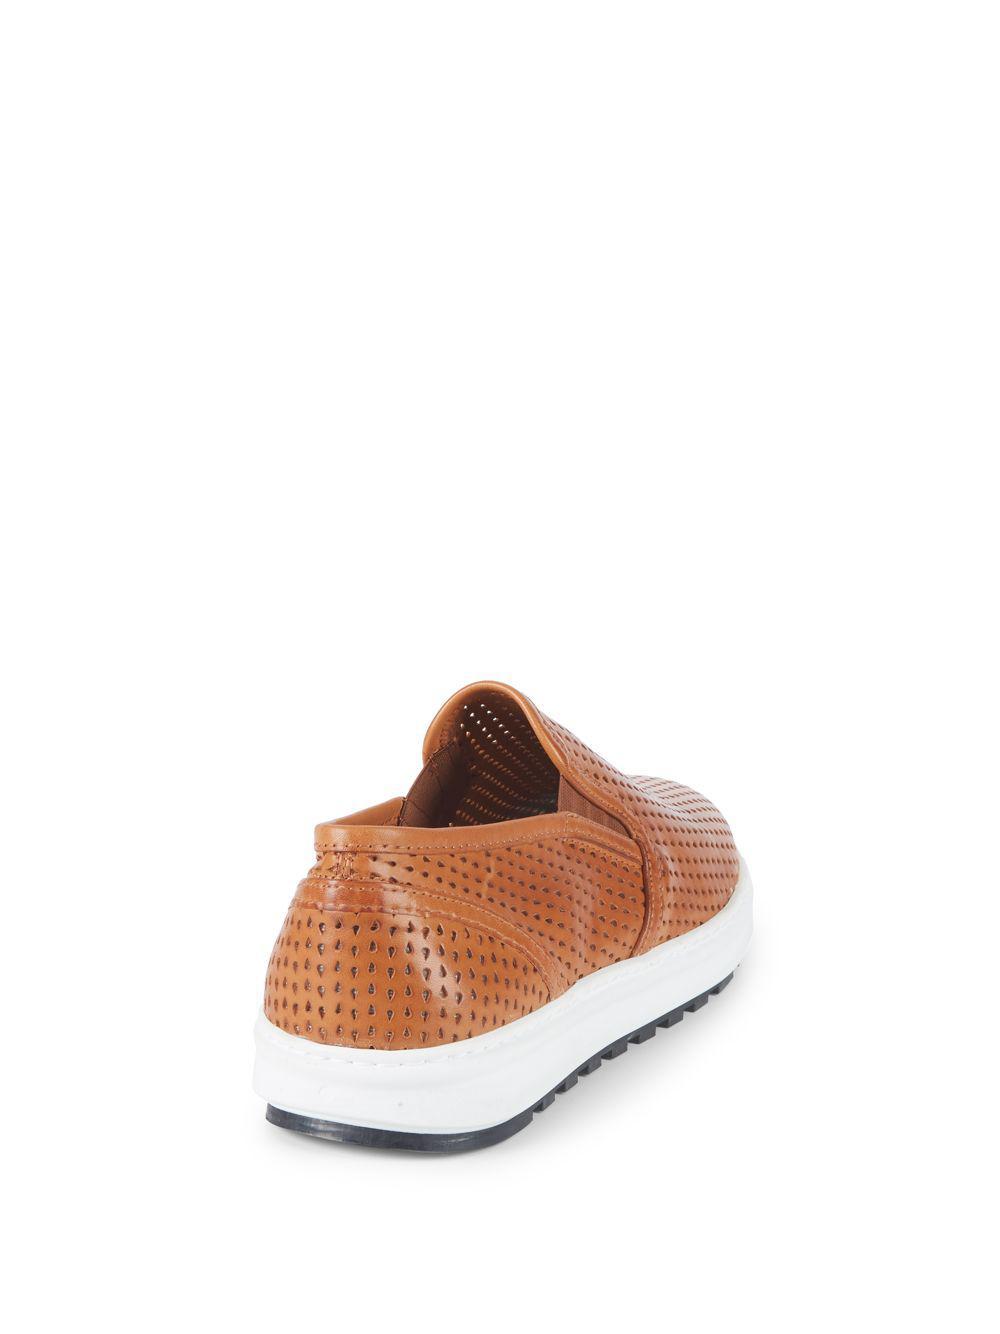 0642433c615 Vince Camuto Sebasten Leather Slip-on Sneakers in Brown - Lyst